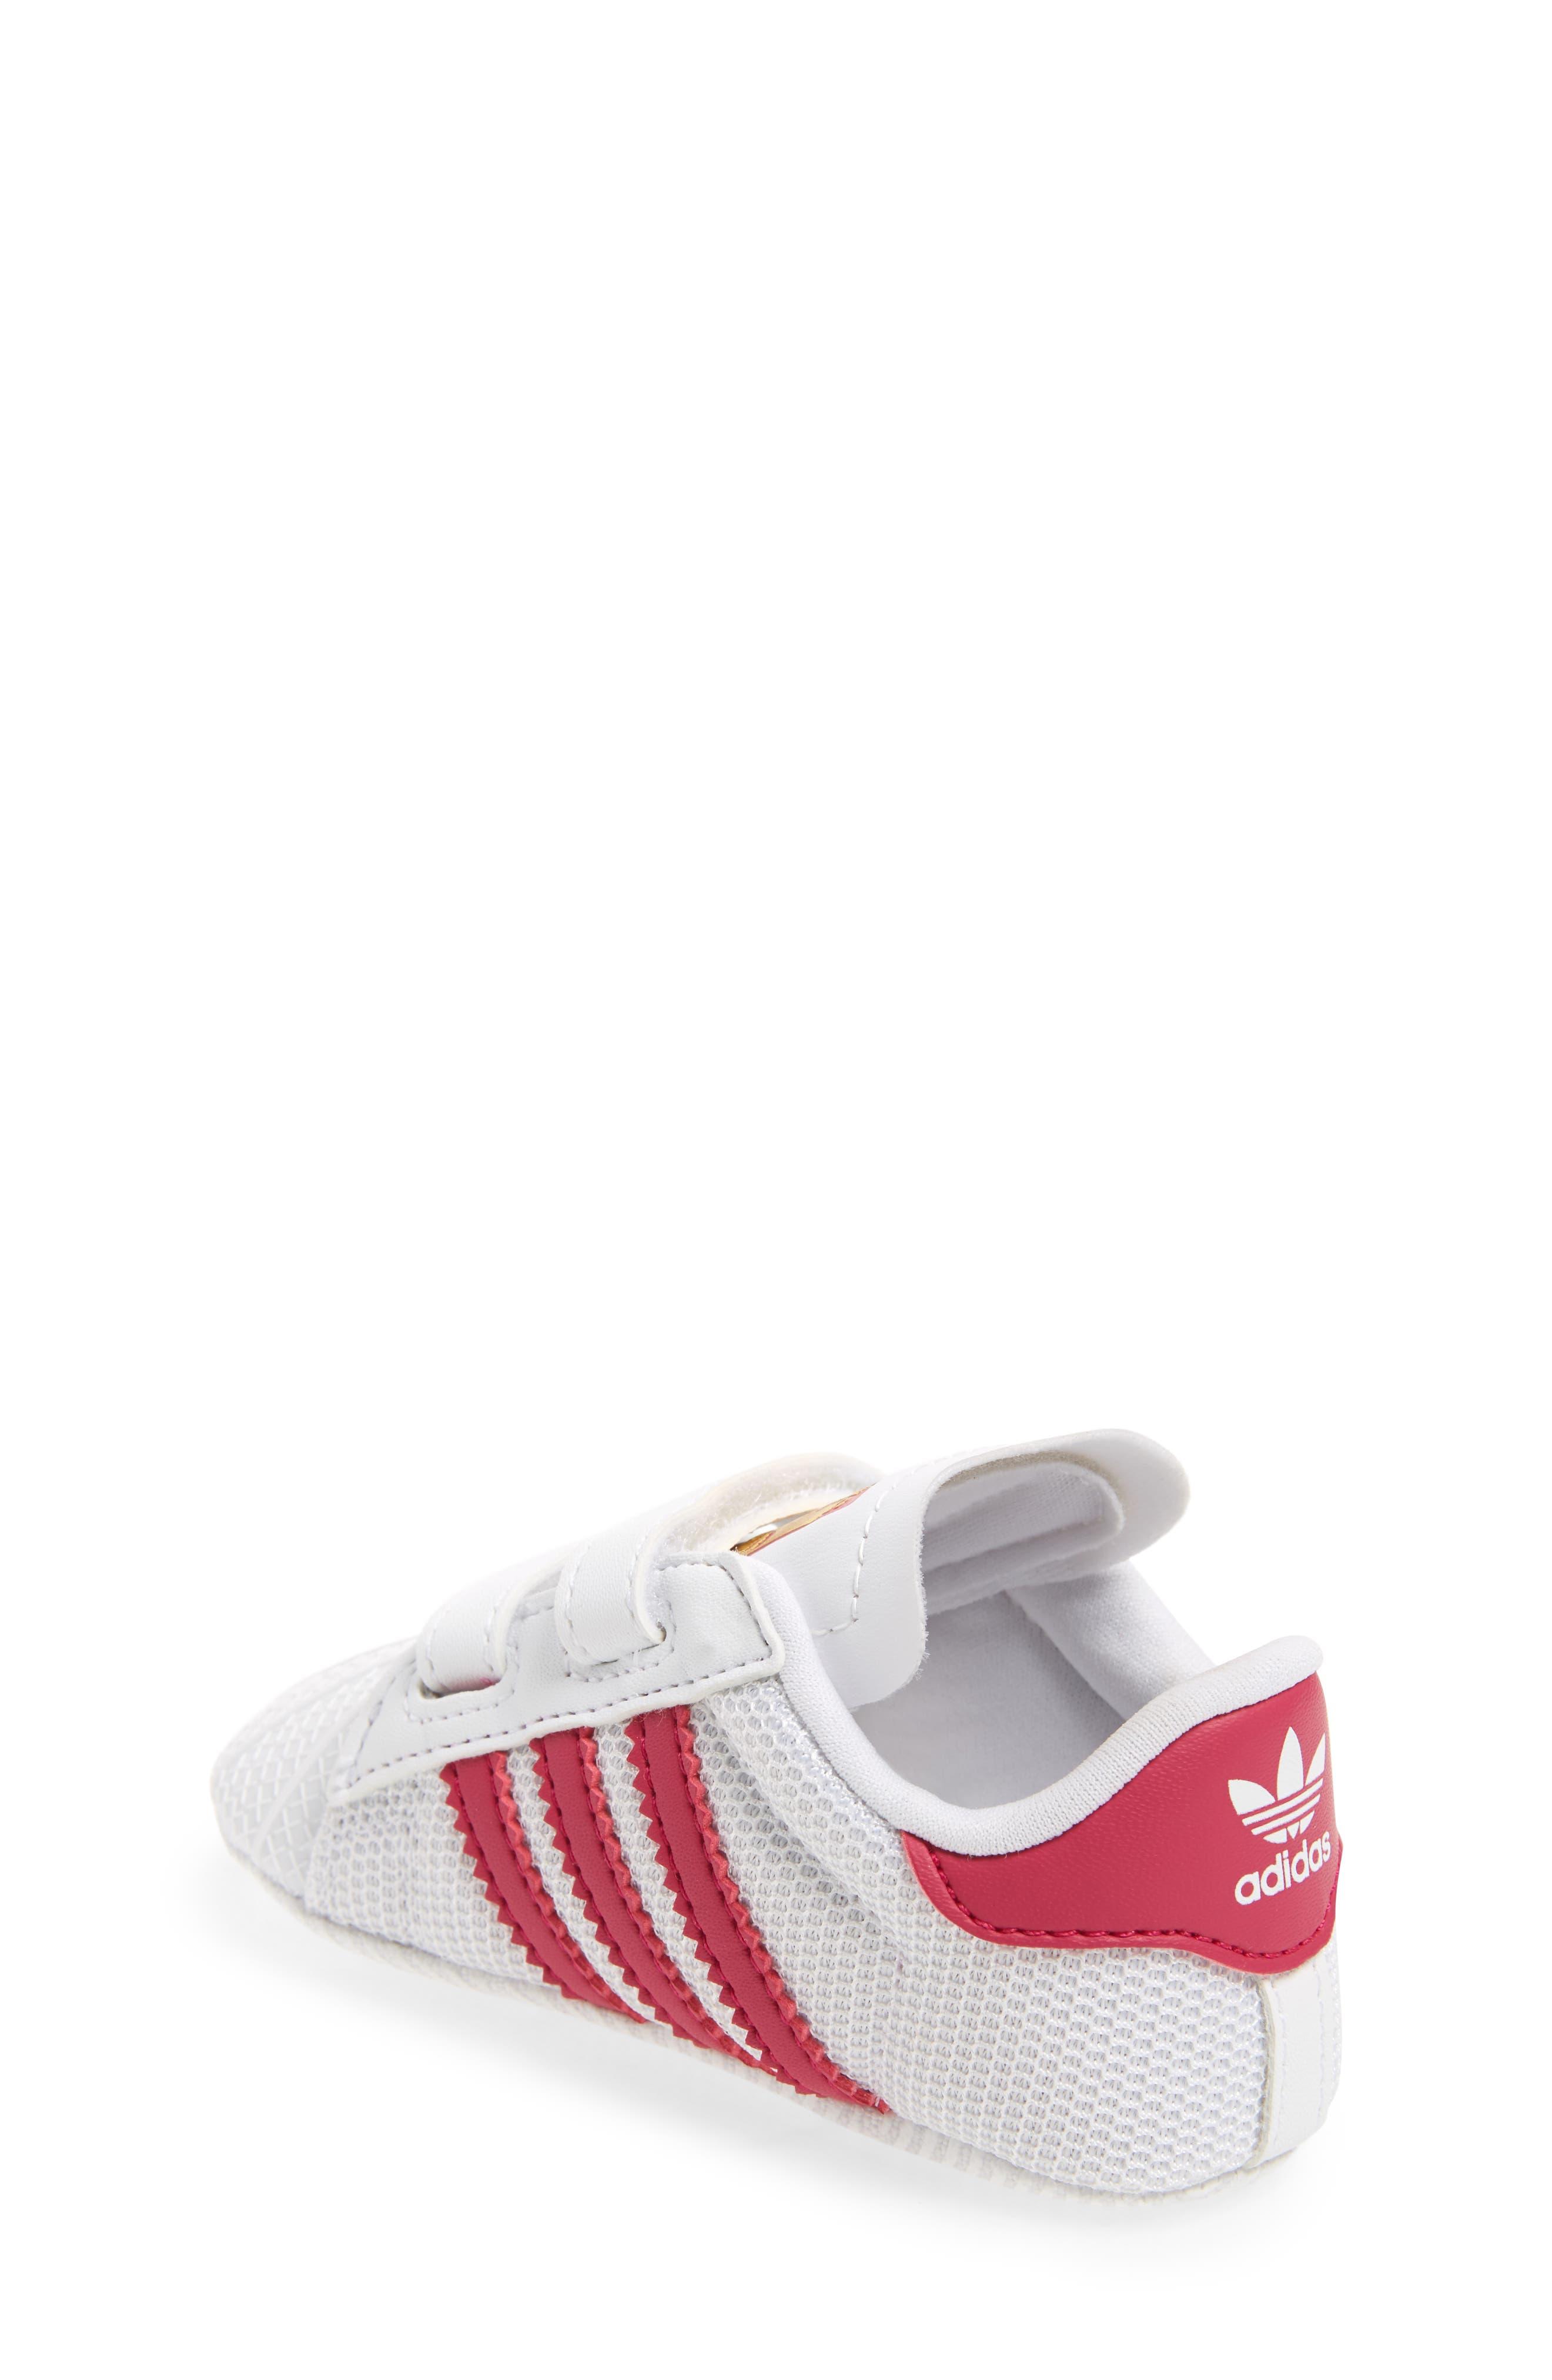 best website 25a1f 7211d Baby, Walker   Toddler Adidas Shoes   Nordstrom